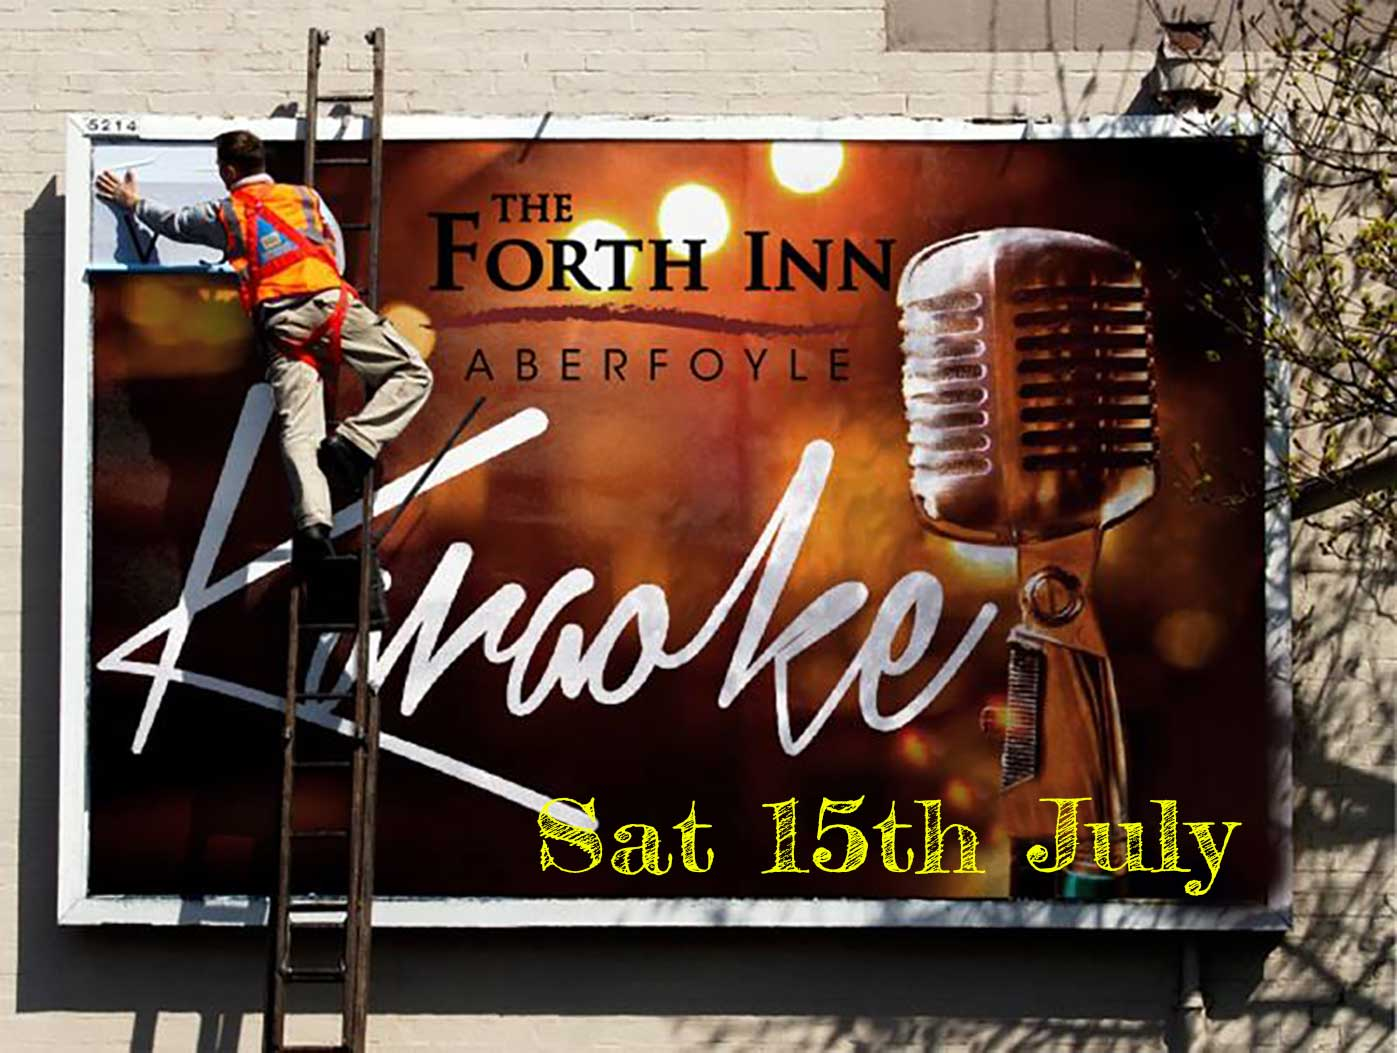 Karaoke at The Forth Inn